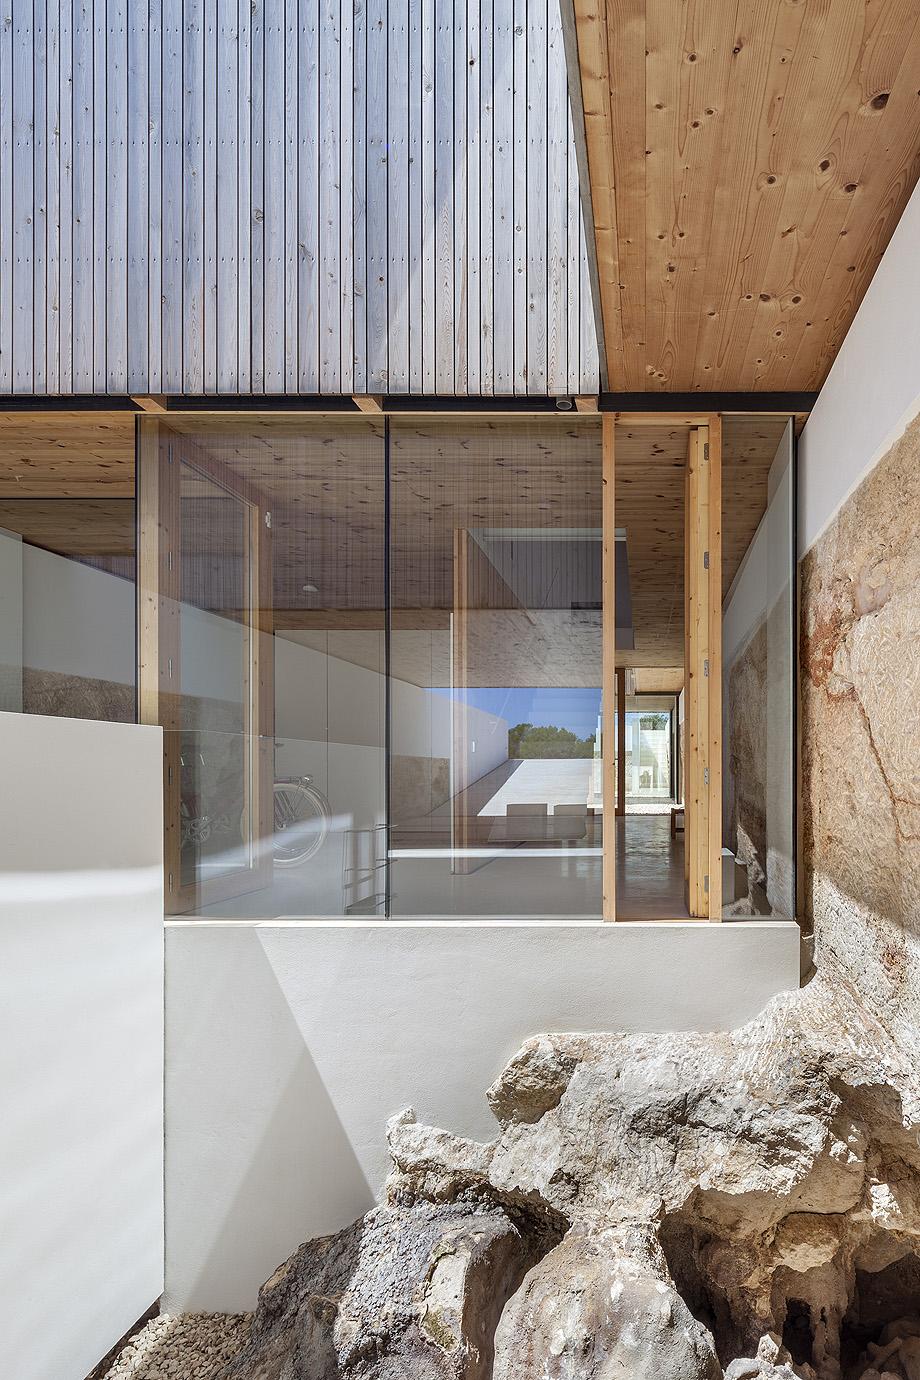 casa privada en formentera por marià castelló (12)